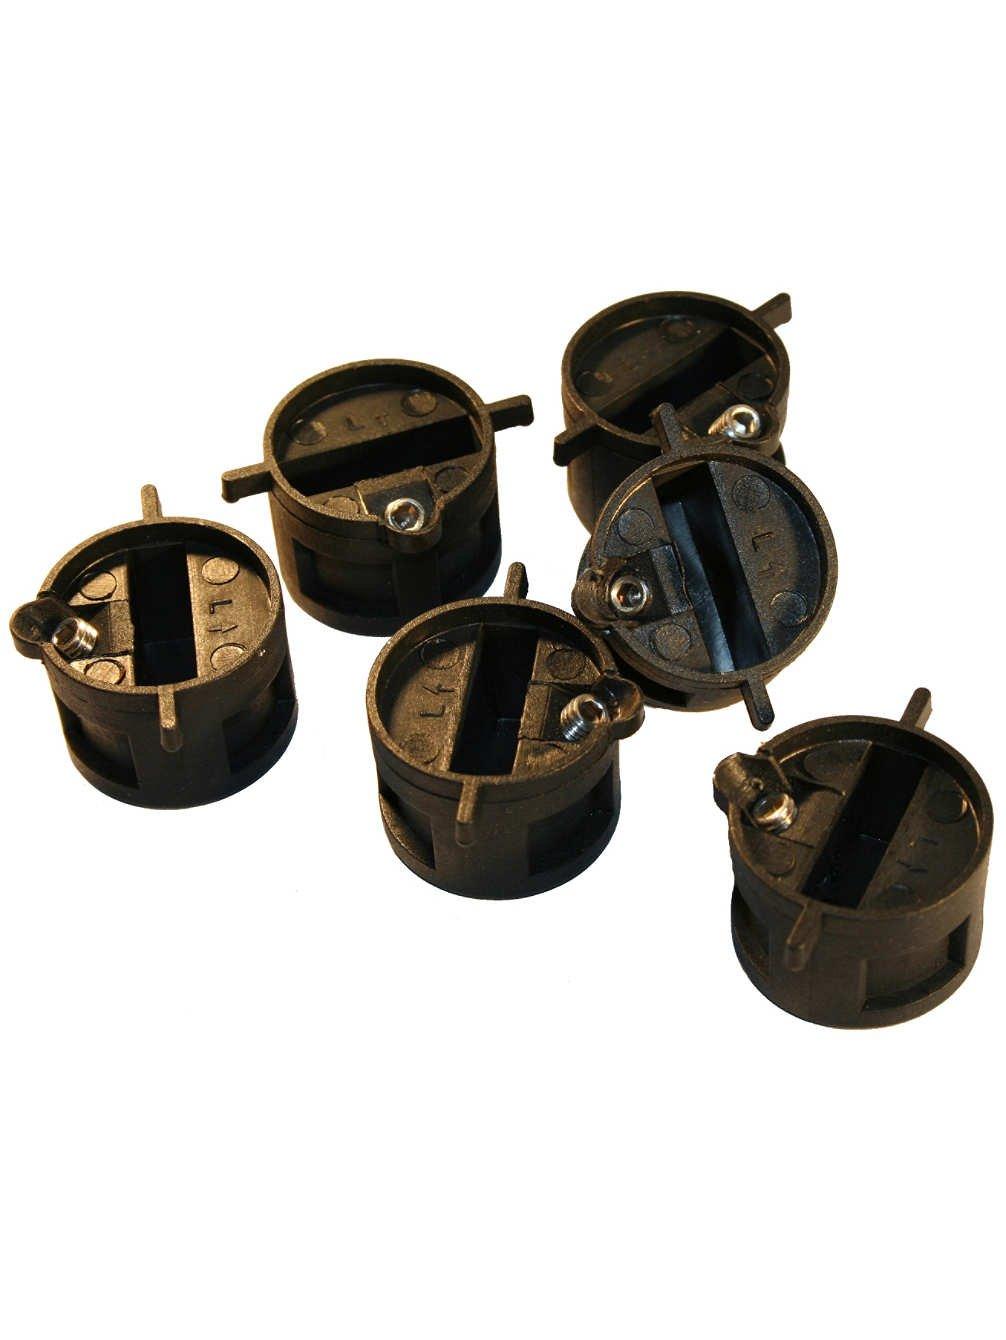 FCS Compatible Fin Plug Set (6 Pcs) Northcore*